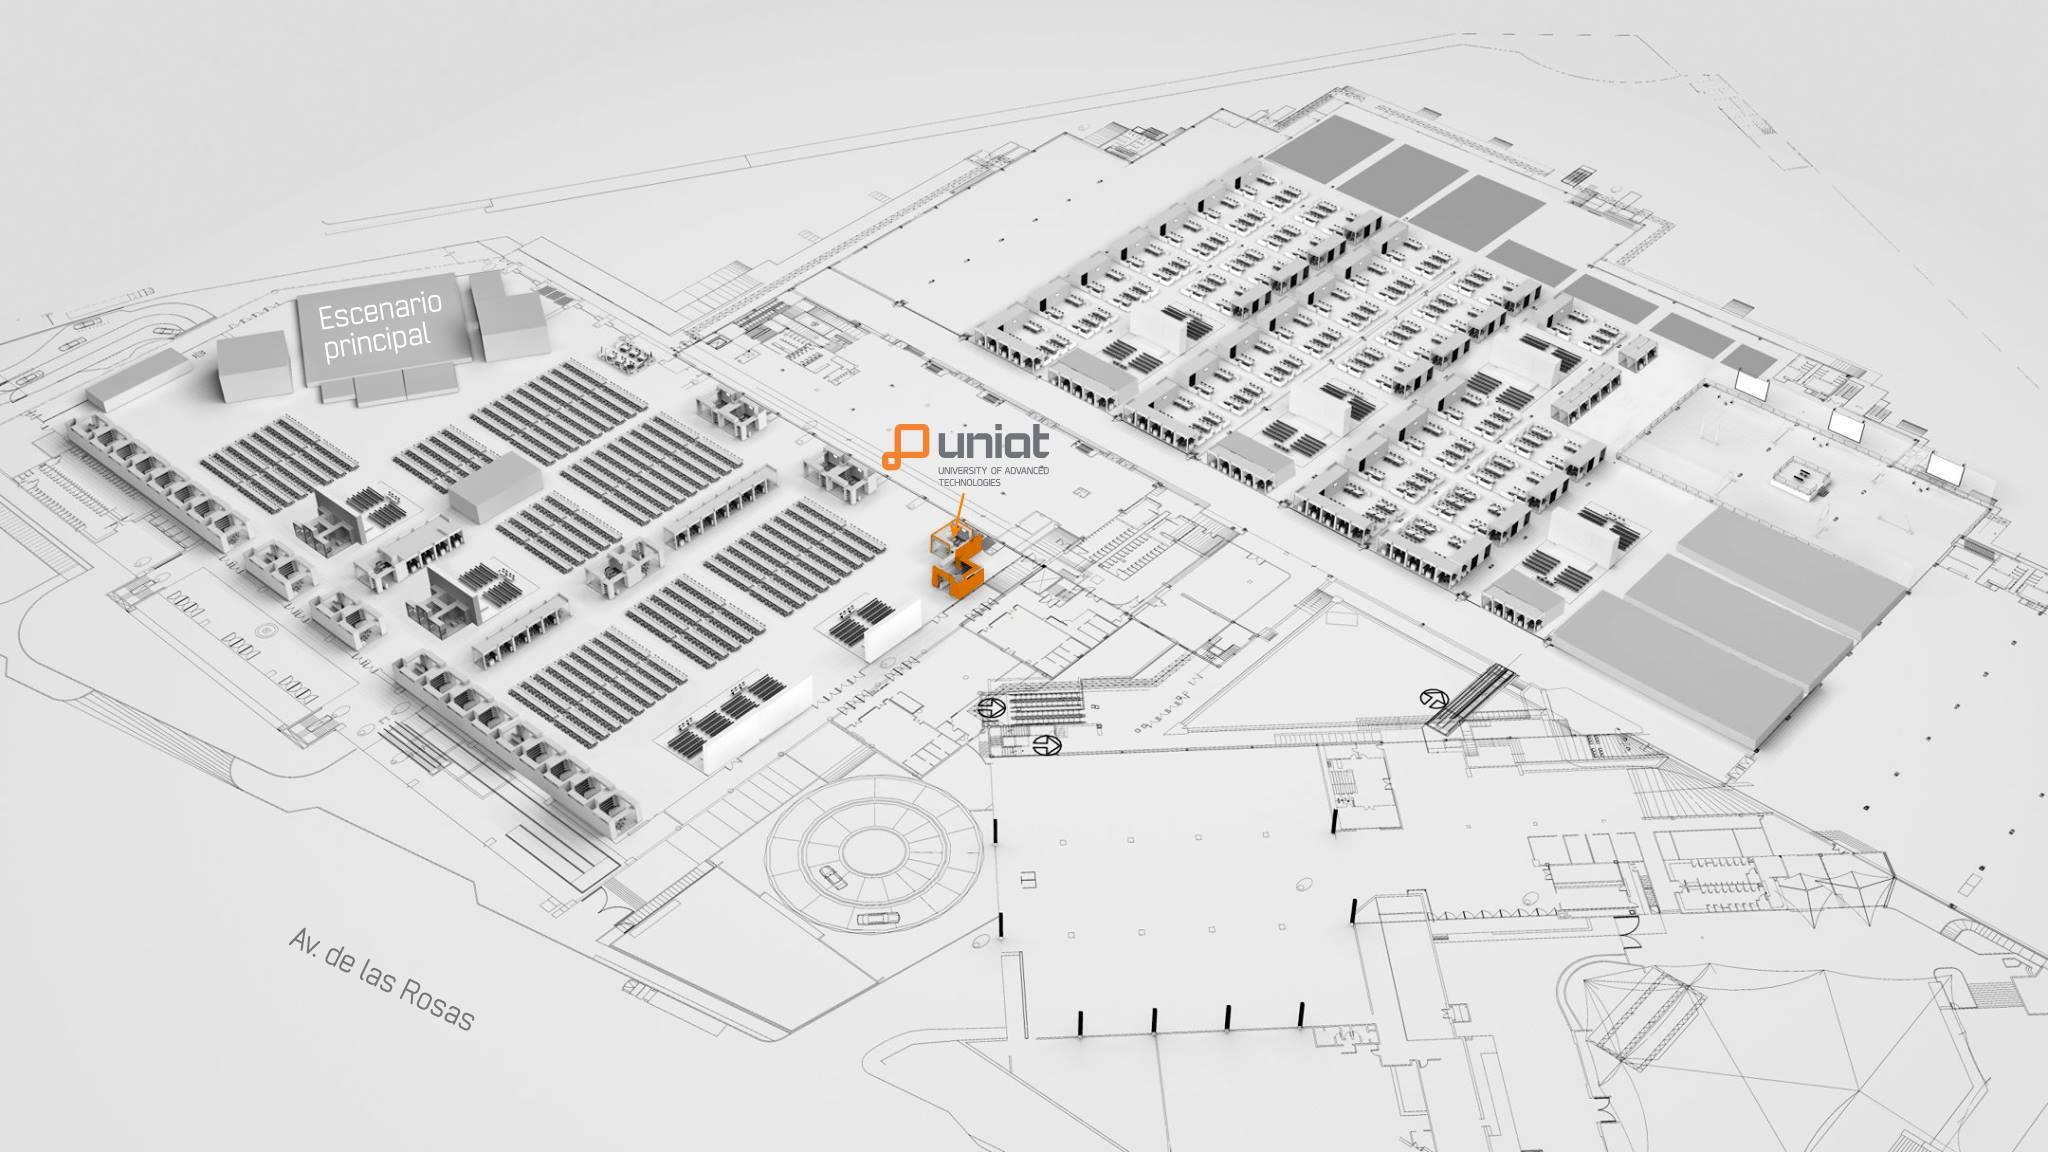 Mapa UNIAT campus party 2016 CPMX7